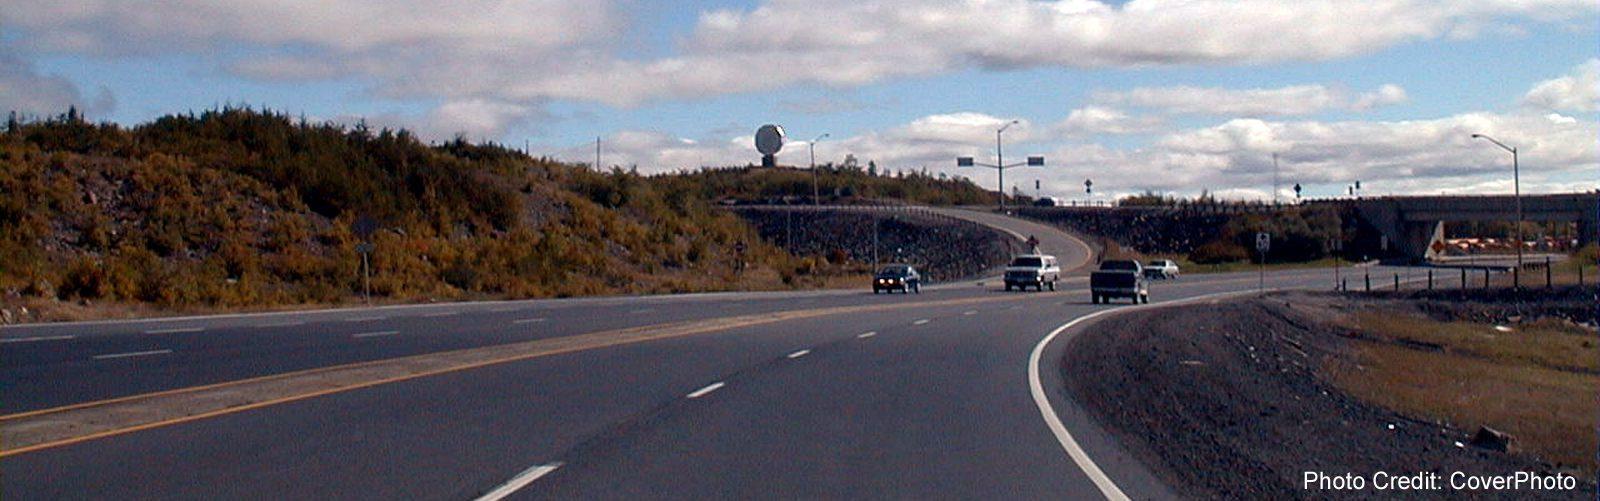 Sudbury - Big Nickel On Regional Road 55 (CoverPhoto)